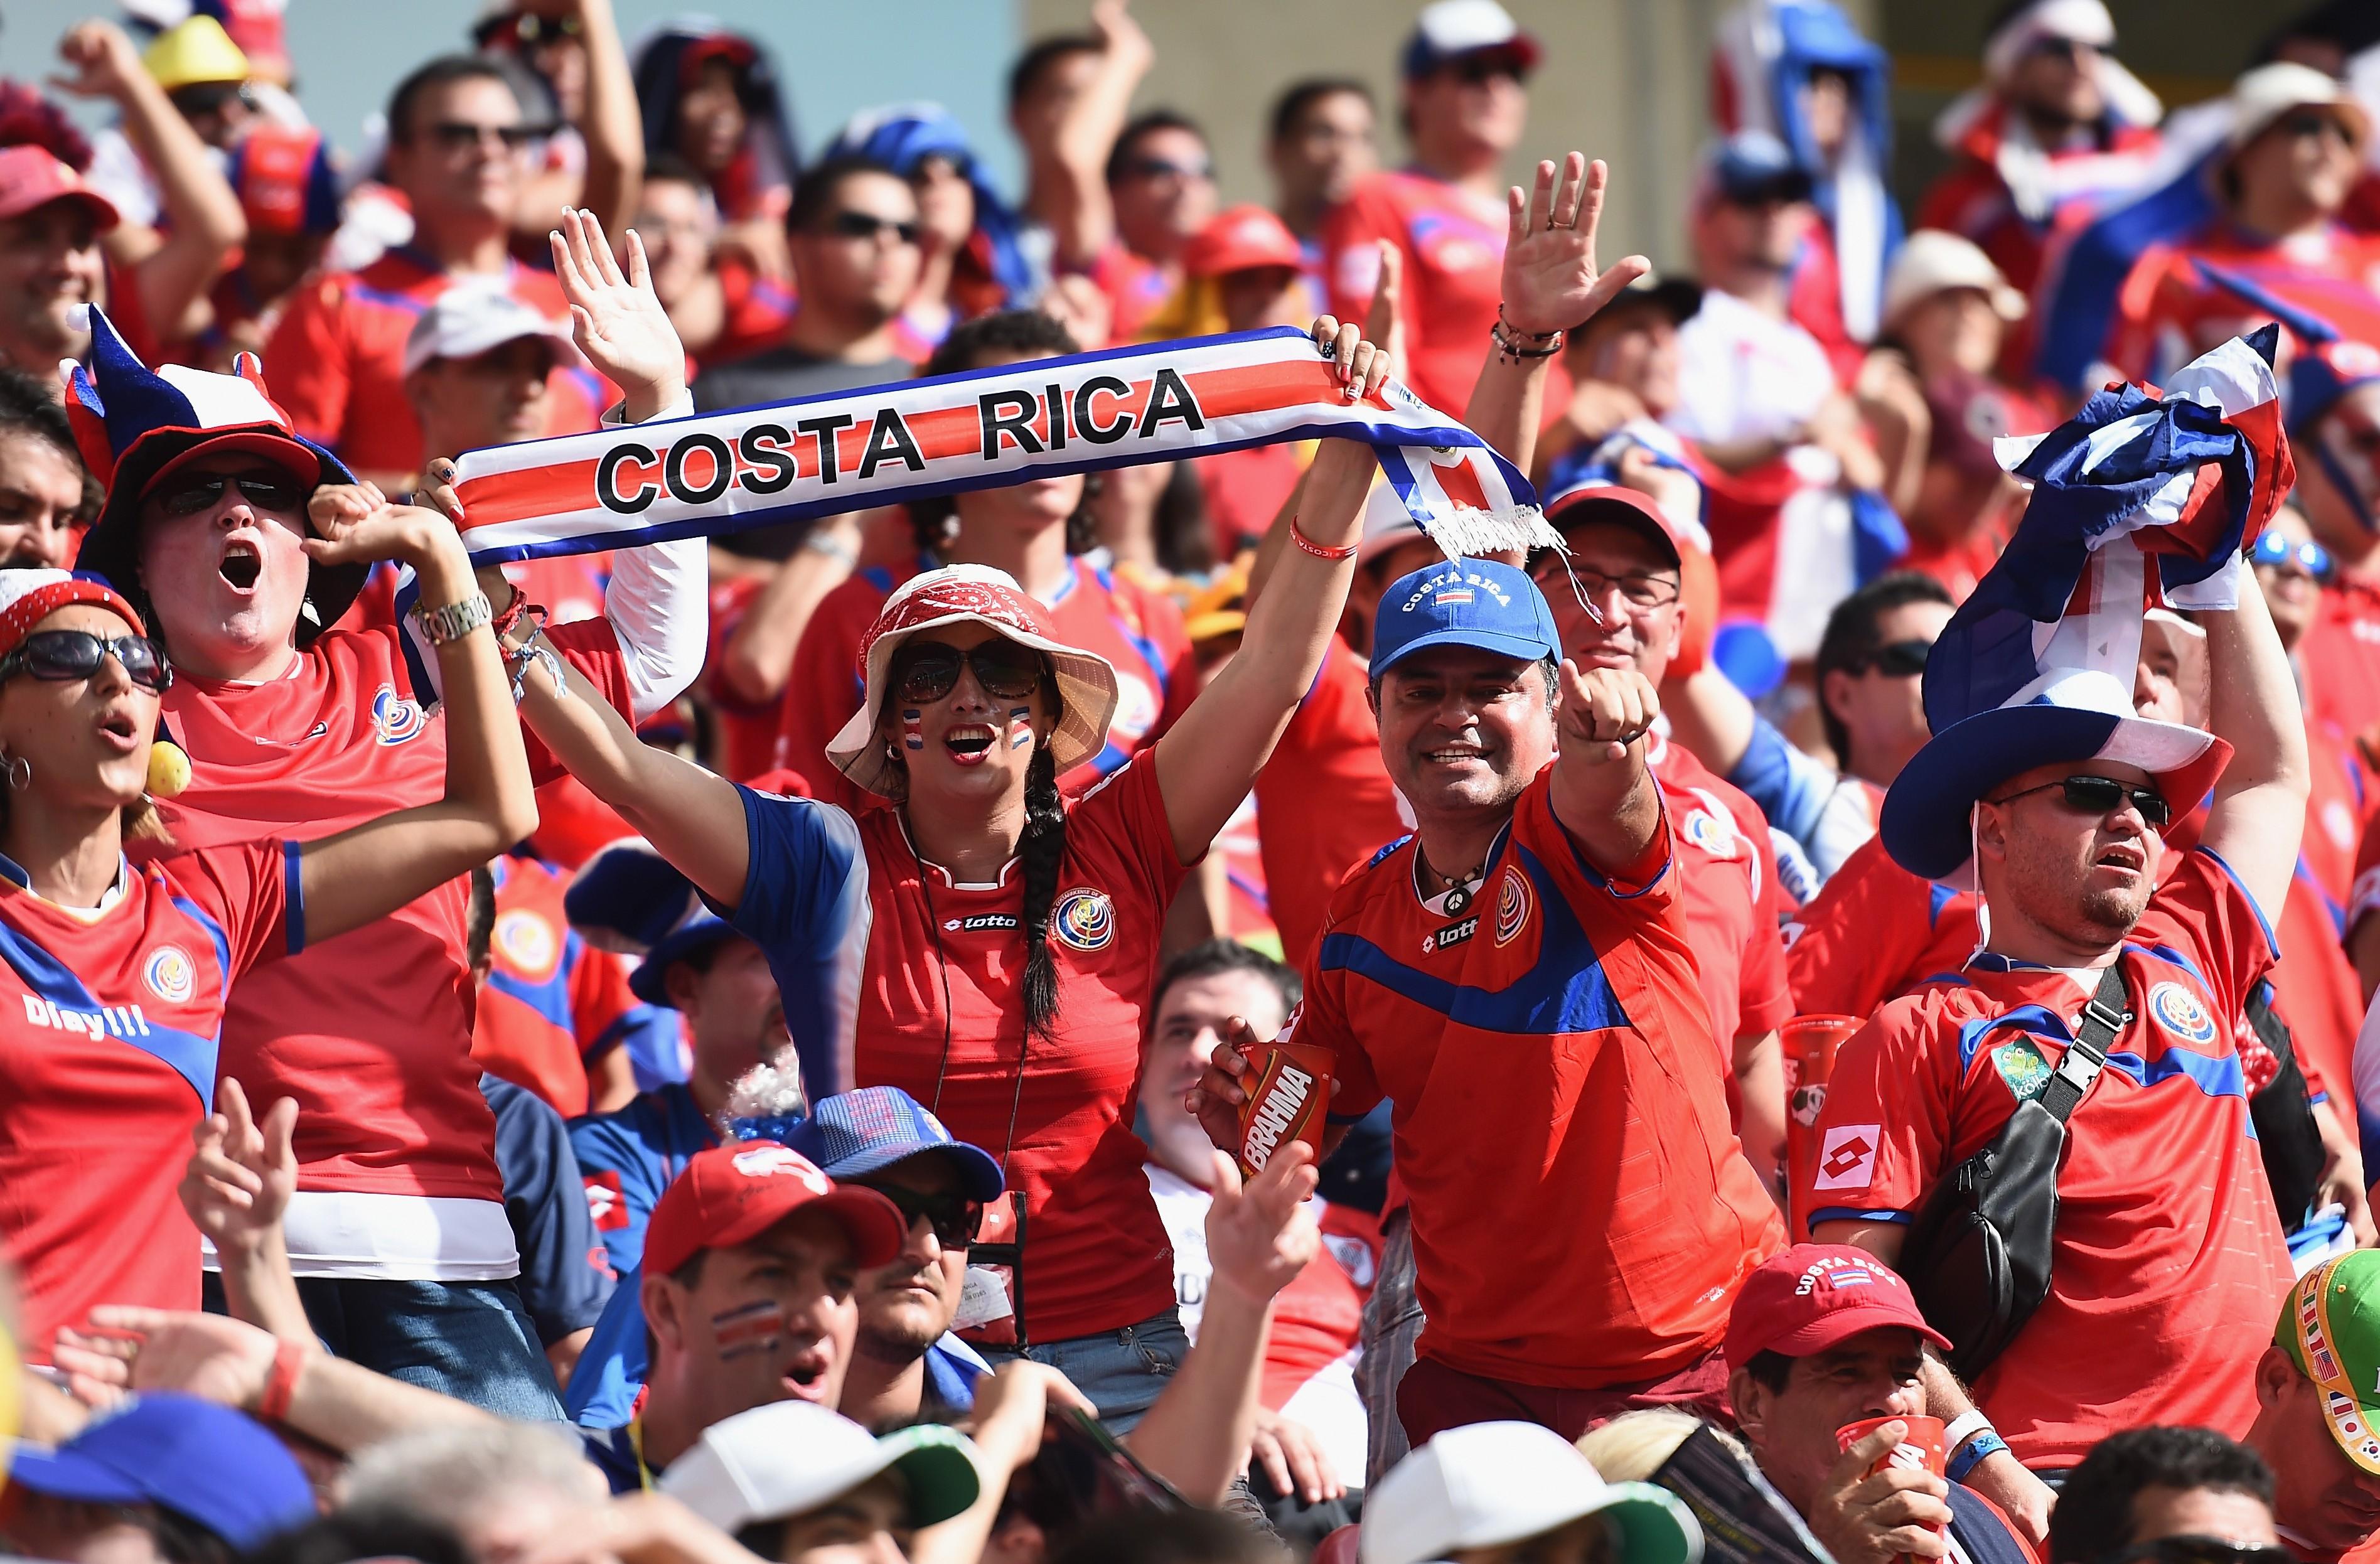 Коста-Рика - Англия. 5 вопросов матча - изображение 2